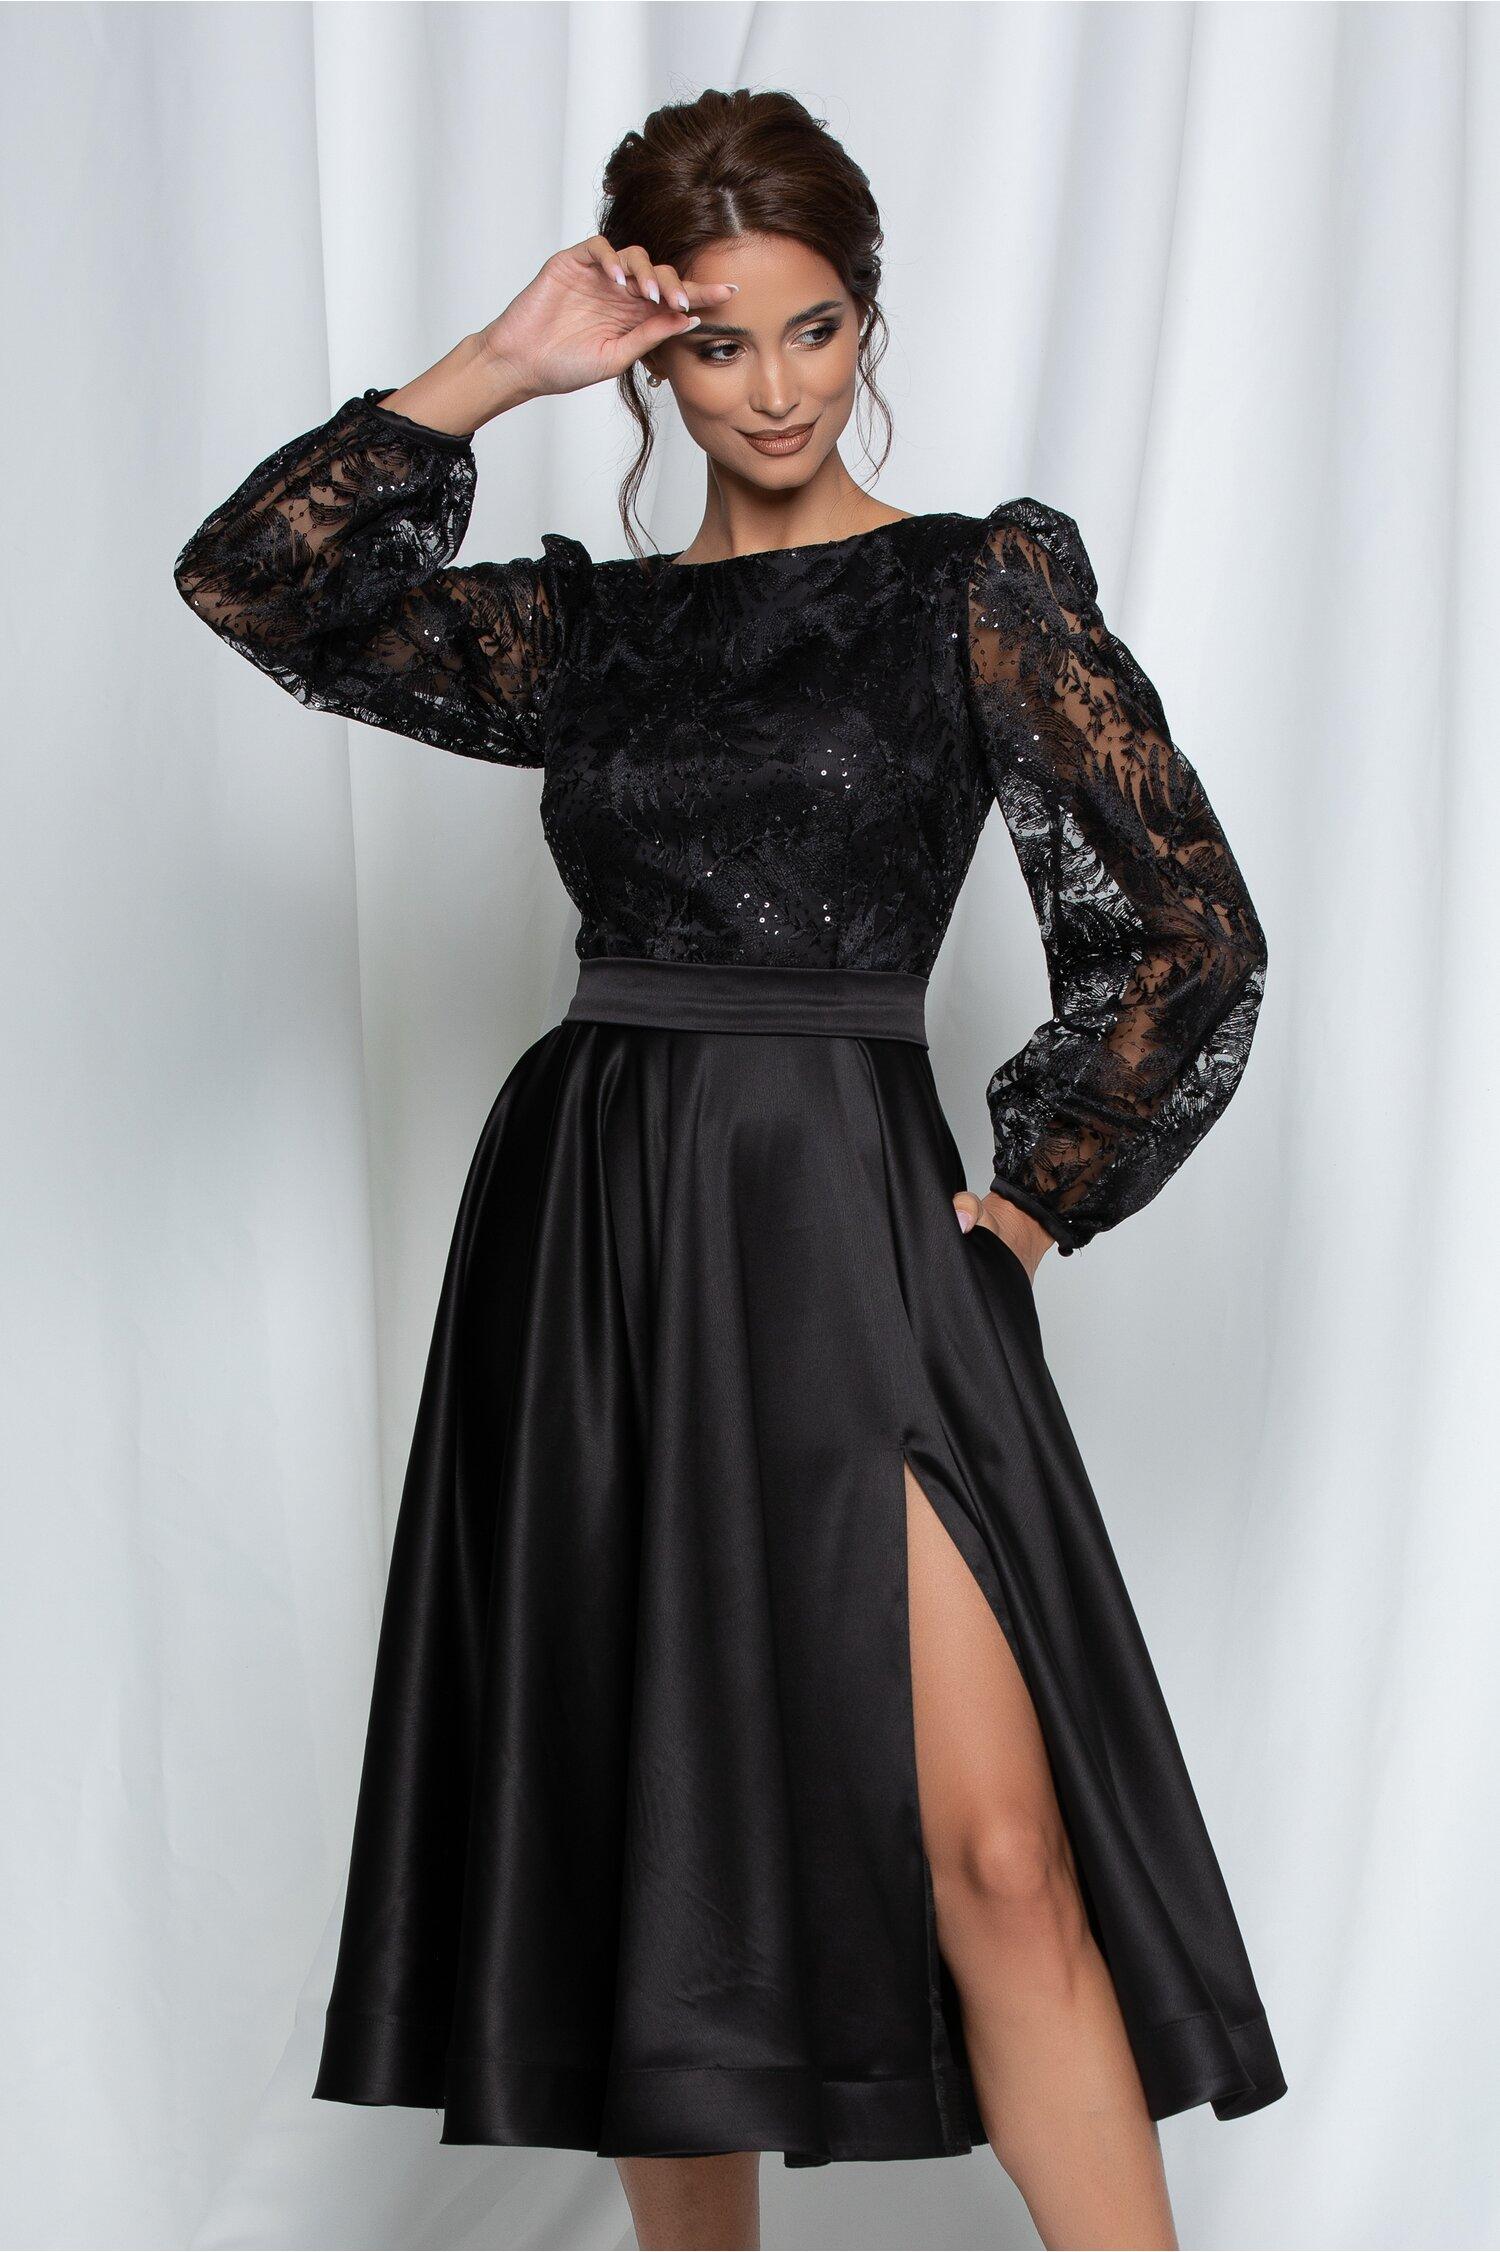 Rochie MBG neagra cu bust din dantela si fusta satinata